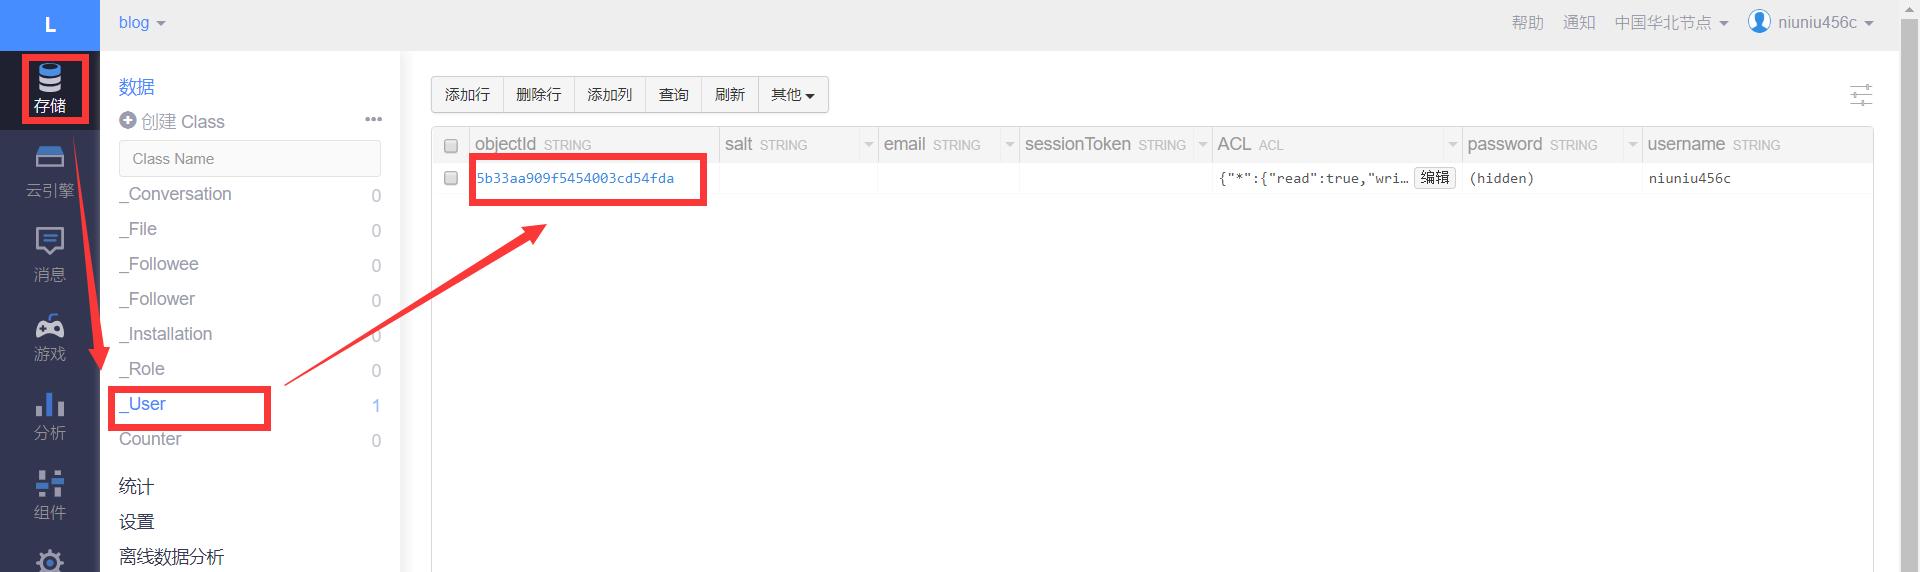 LeanCloud用户查看